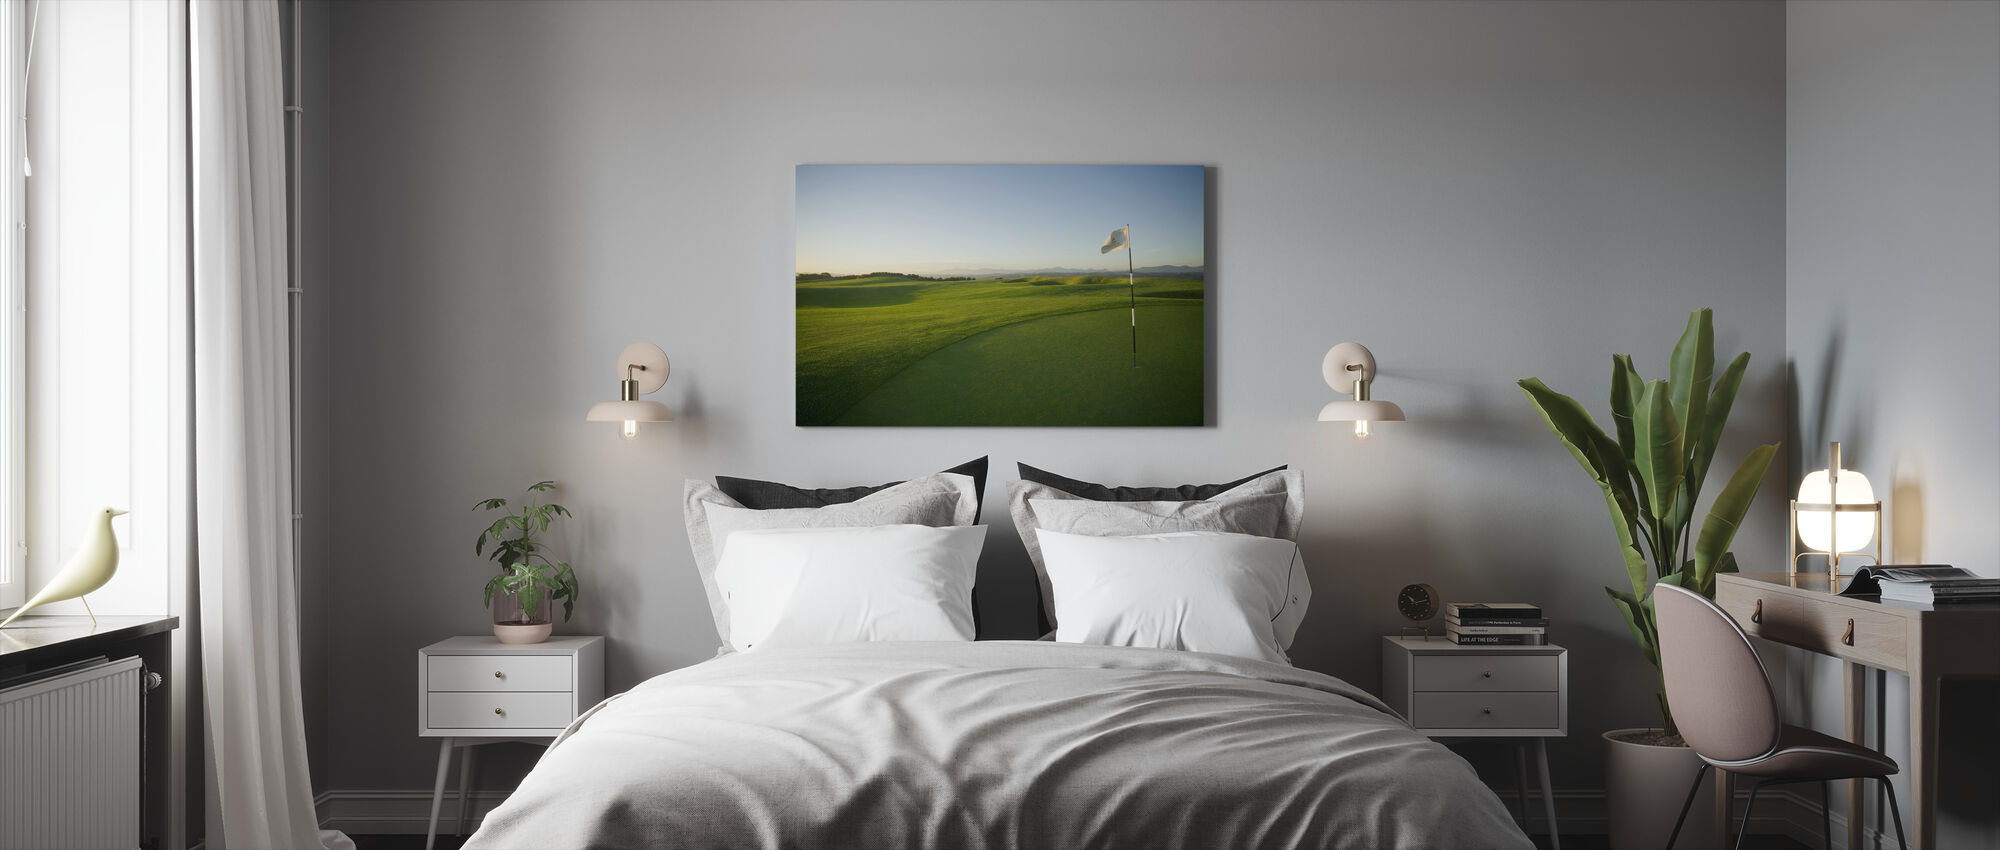 Zuid-Afrikaanse golfbaan - Canvas print - Slaapkamer